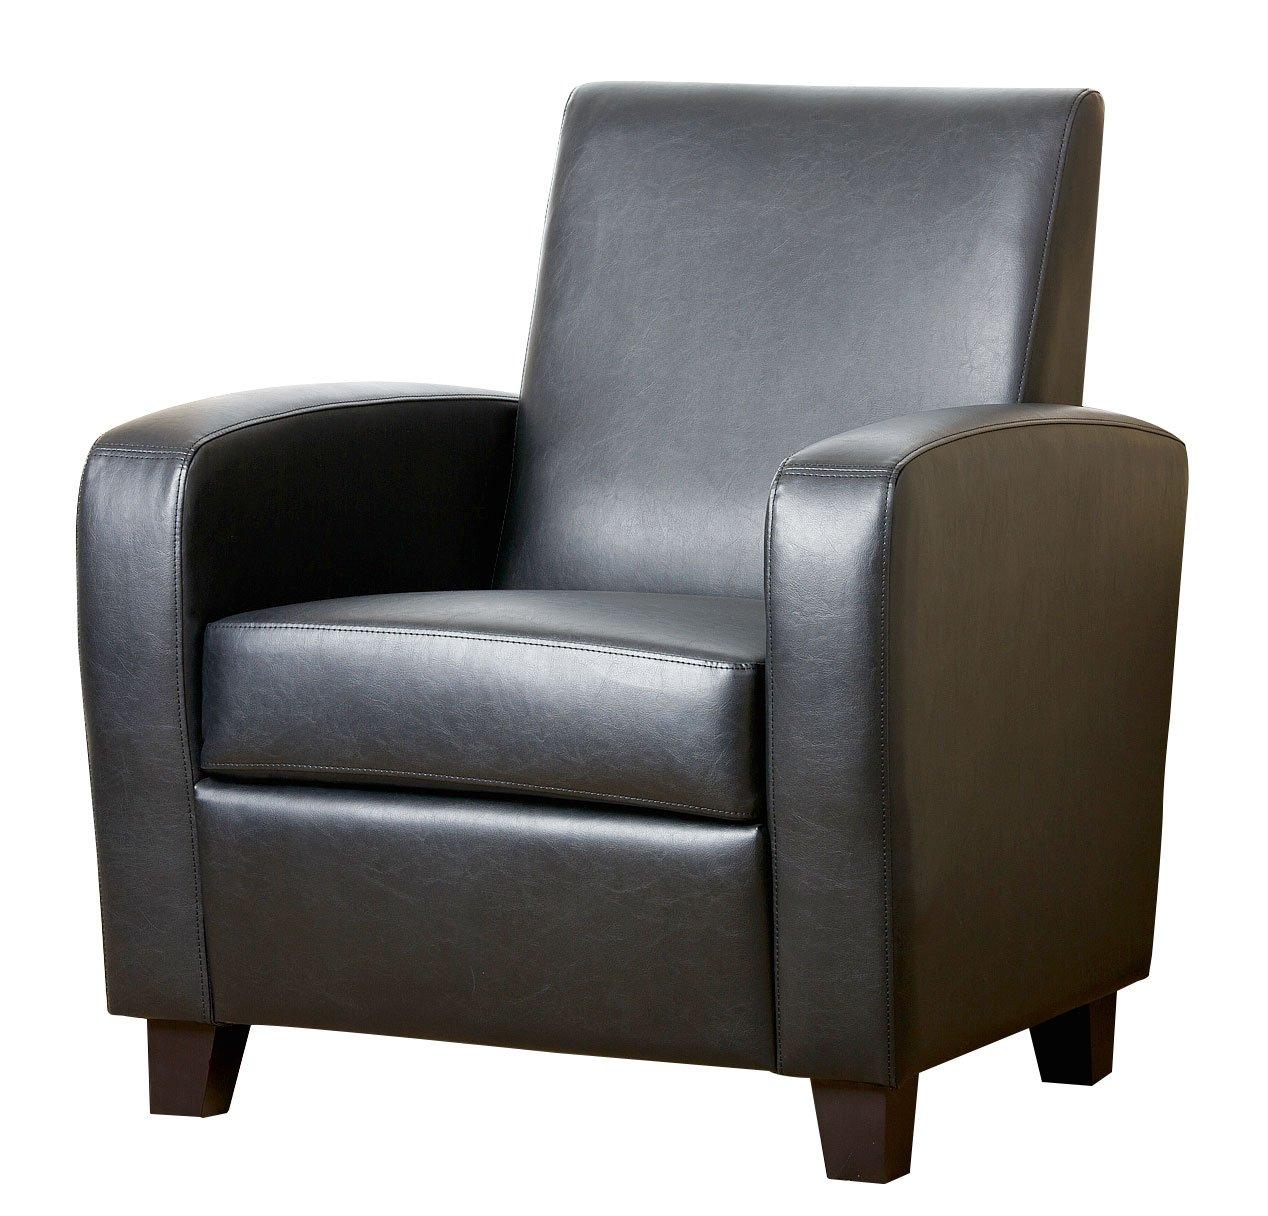 Beau Amazon.com: Abbyson® Mercer Bonded Leather Club Chair, Black: Kitchen U0026  Dining